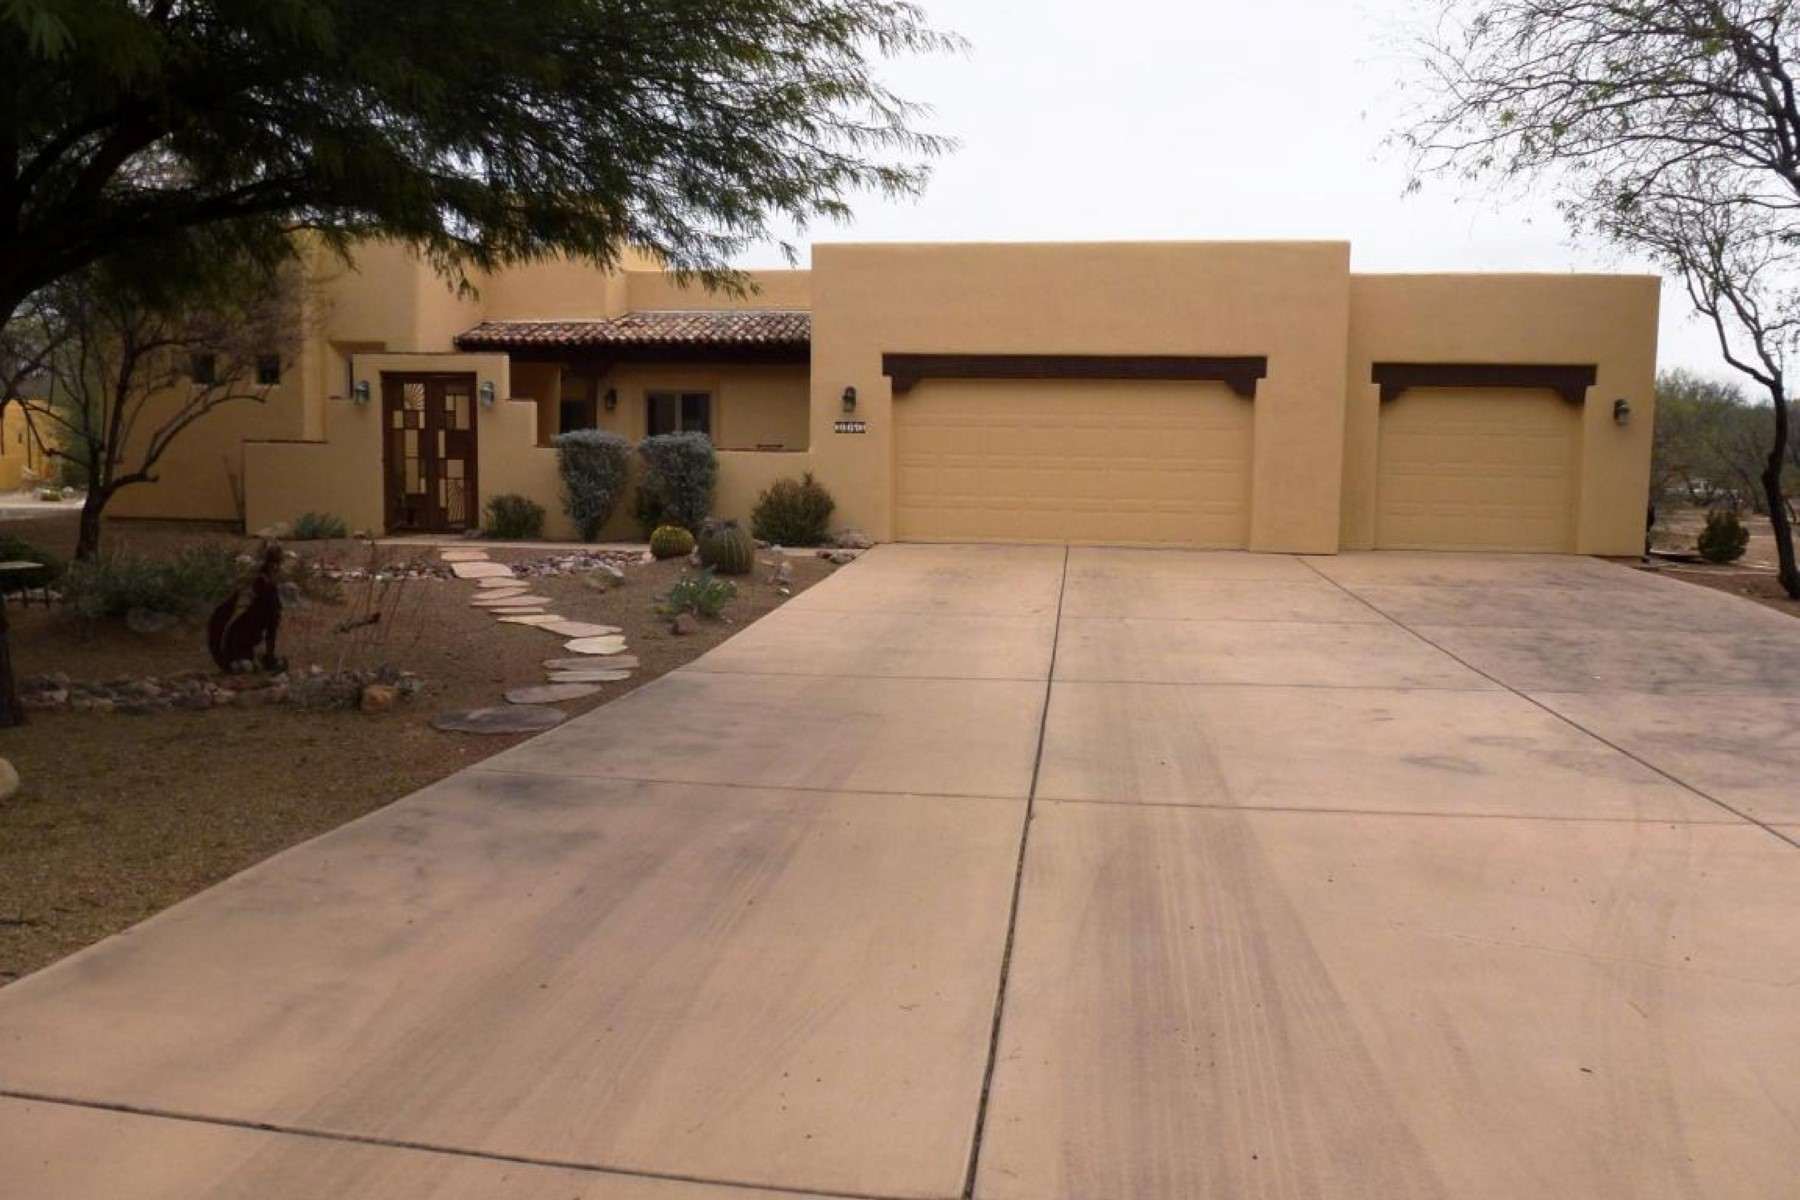 Single Family Home for Sale at Beautiful Dorn Hacienda on a rare lot 2163 Corte Bautista Tubac, Arizona, 85646 United States